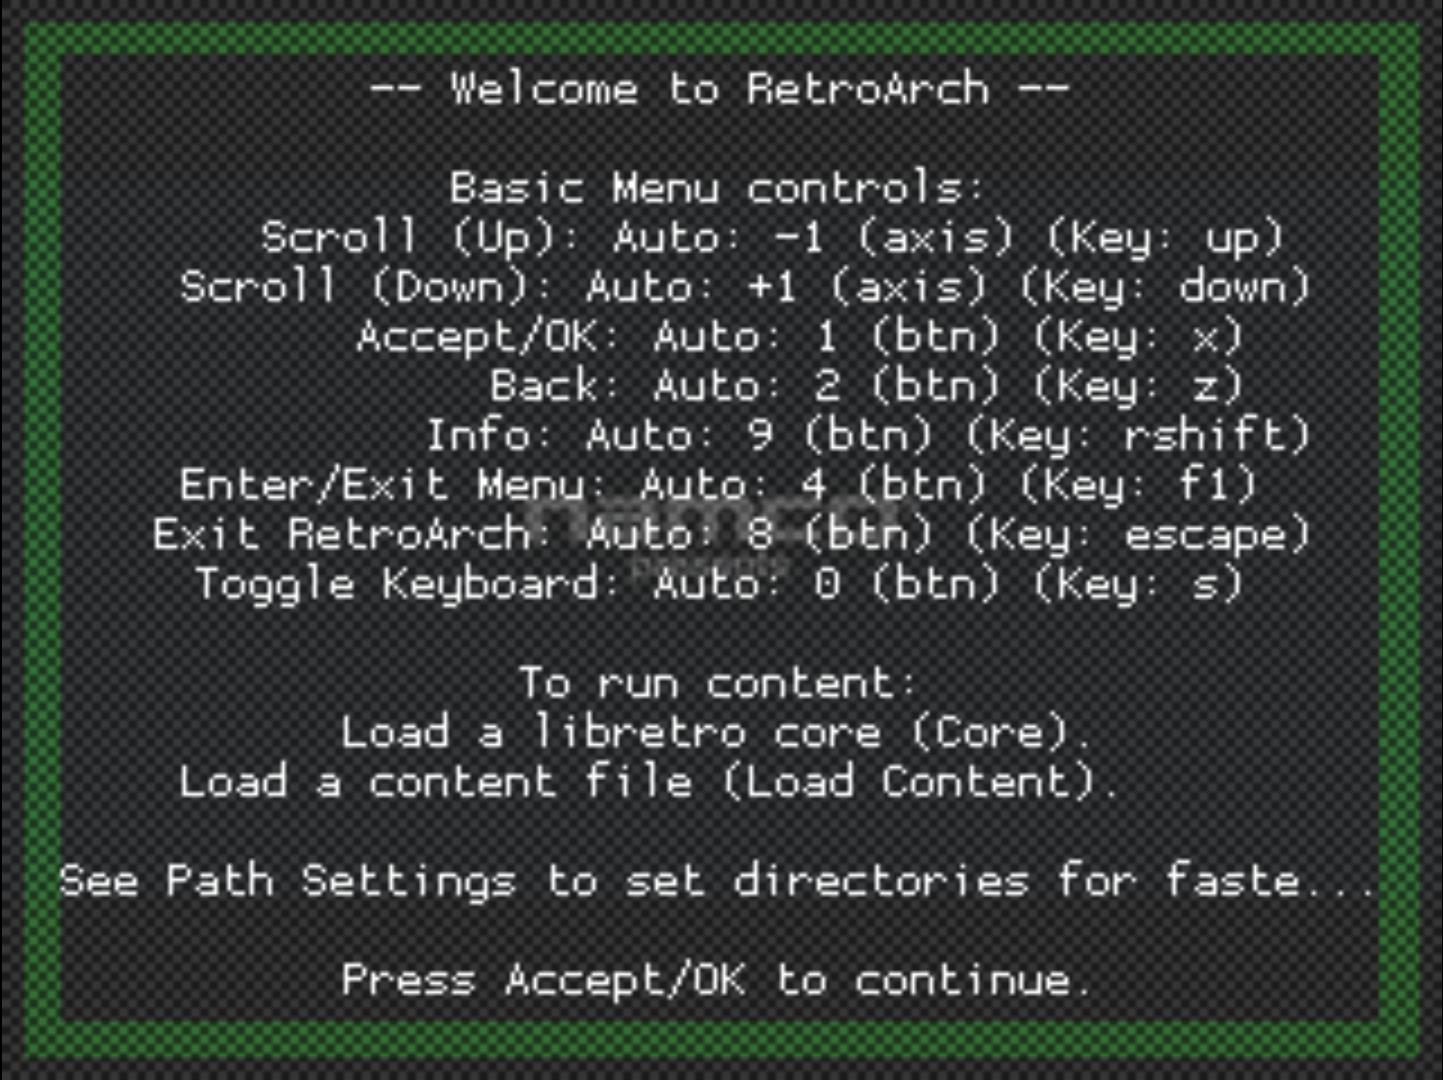 RetroPie Emulation: RetroArch, Libretro, and the Power of the